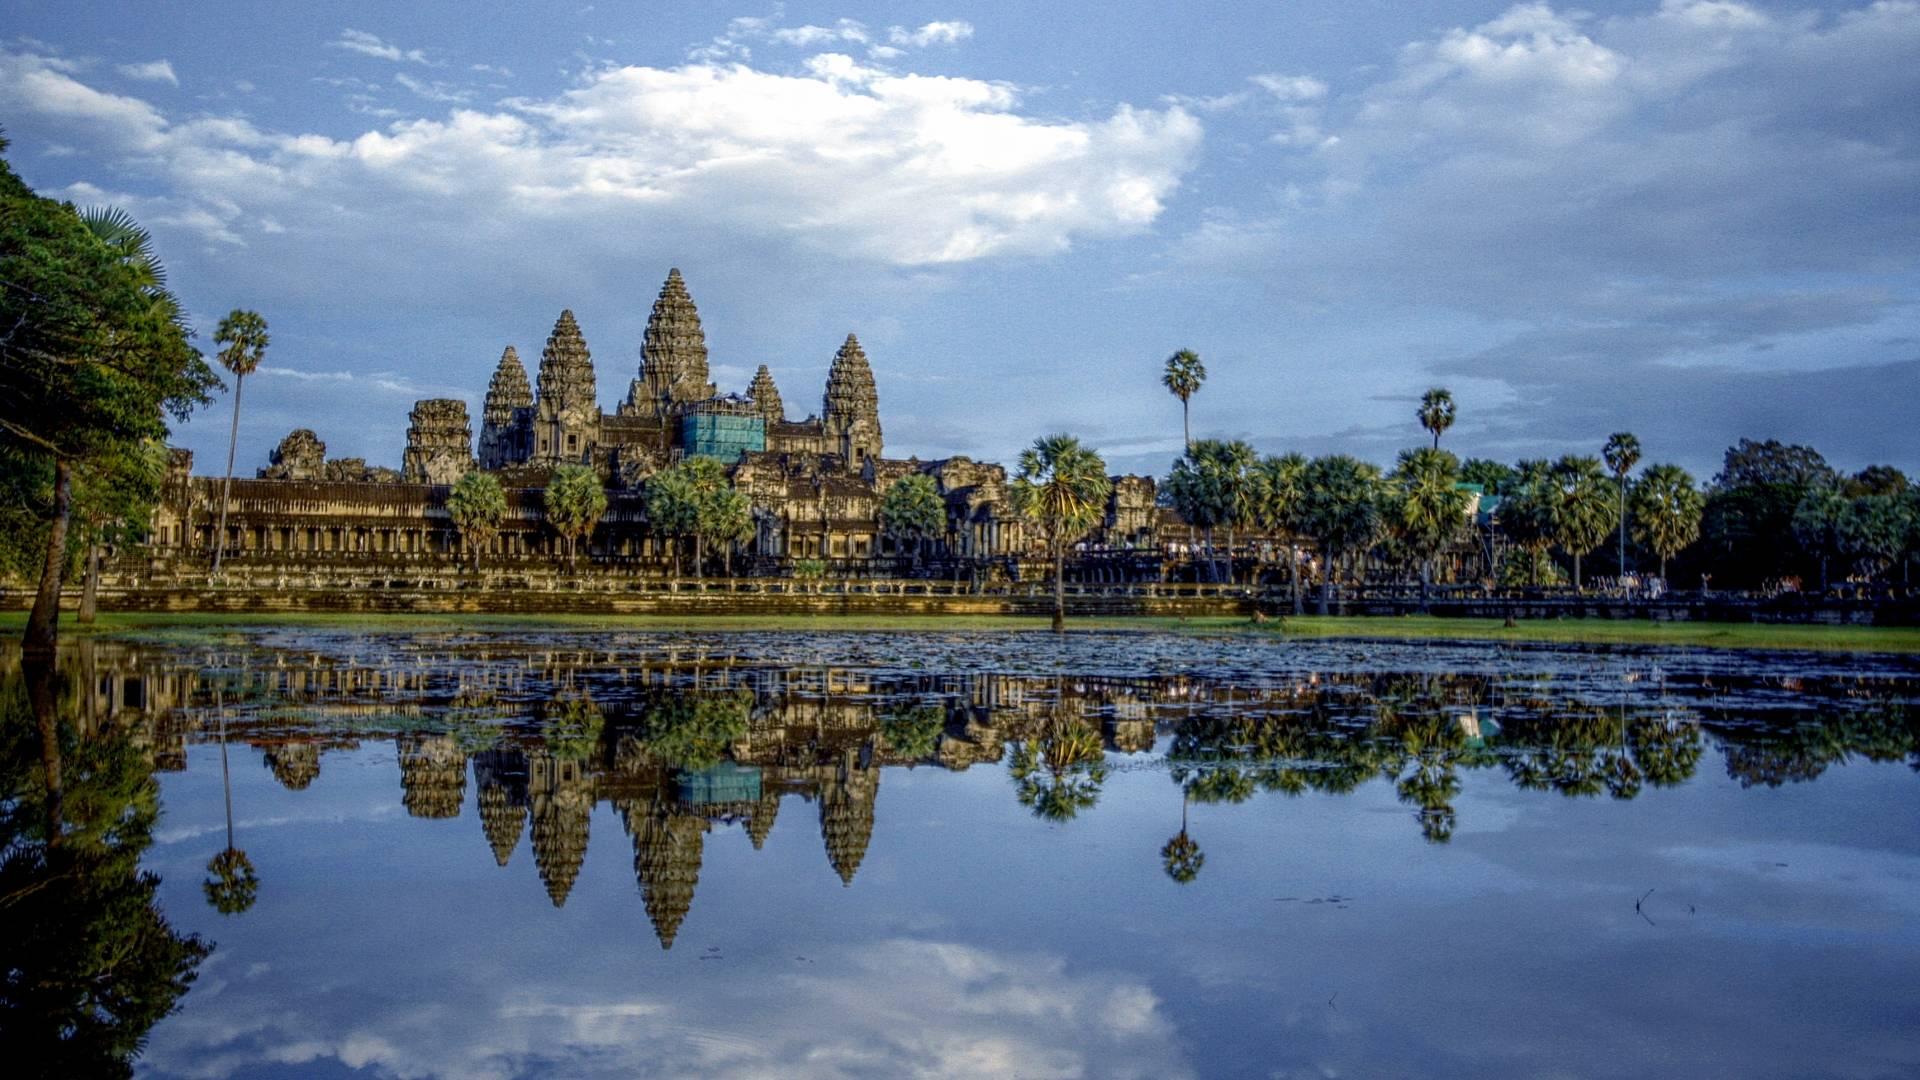 Angkor Wat Wallpapers - Wallpaper Cave